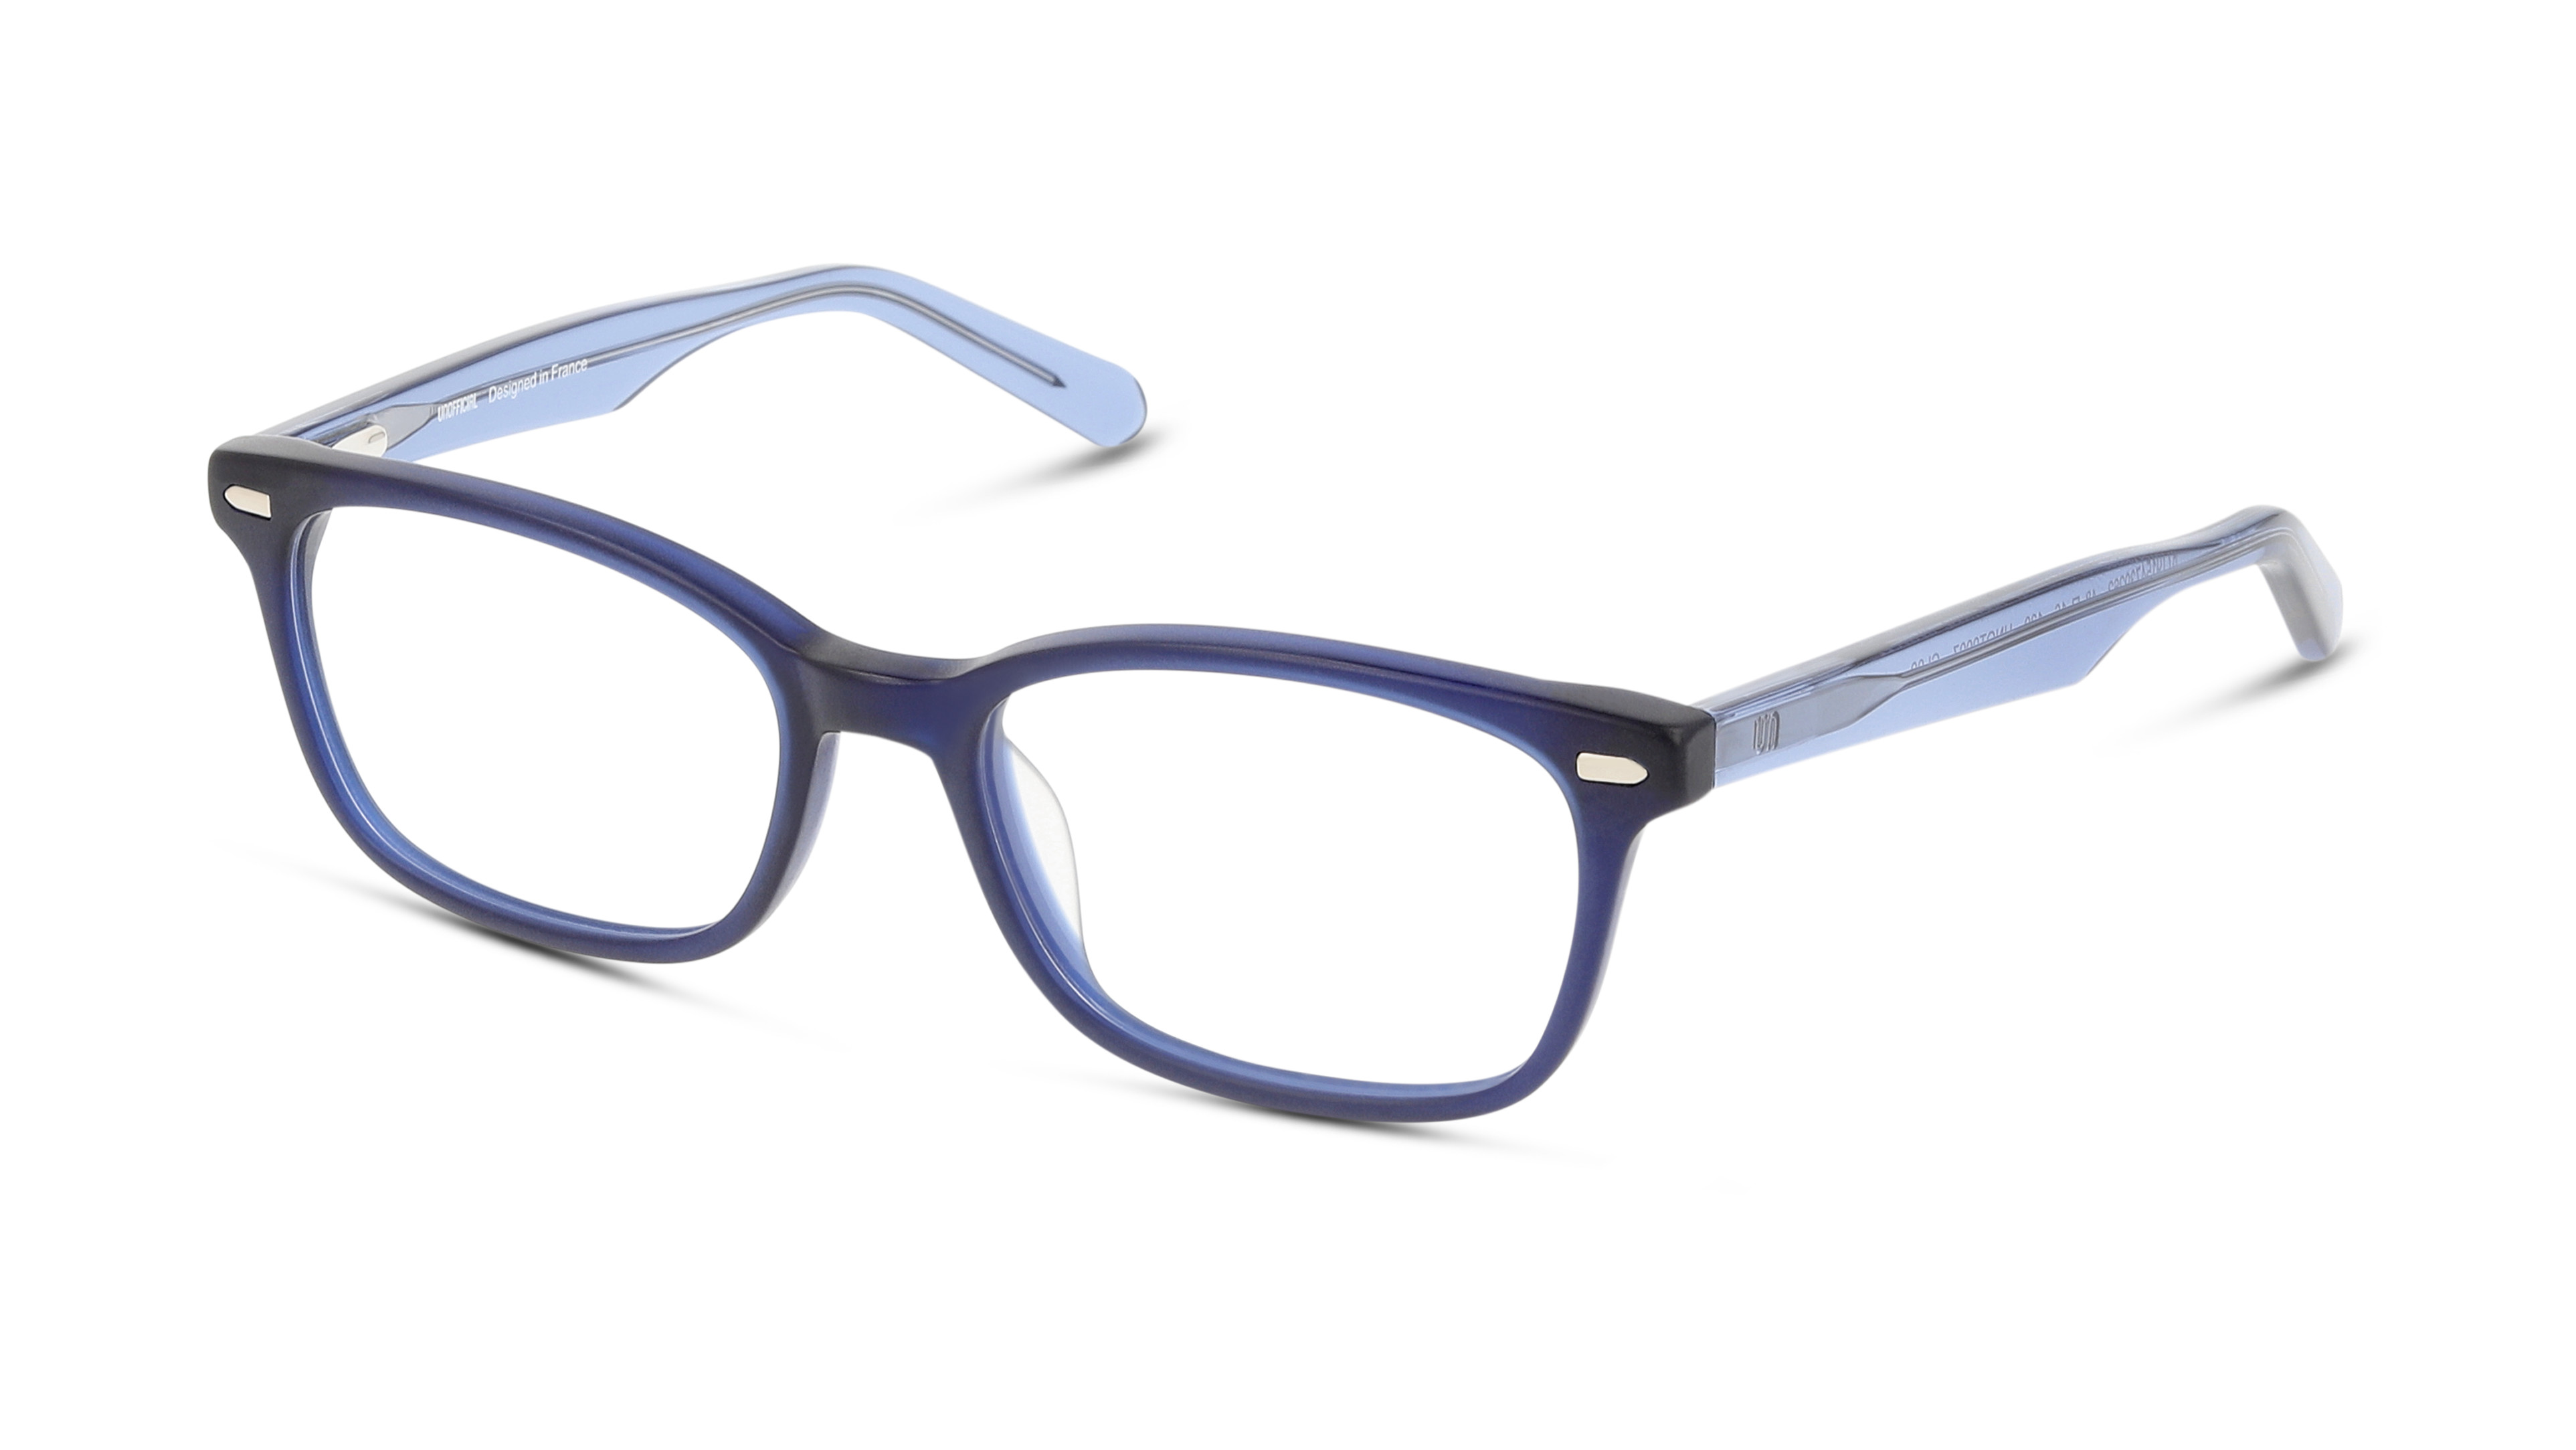 8719154739262-angle-unofficial-Brillenfassung-unot0007-filter-blue-blue